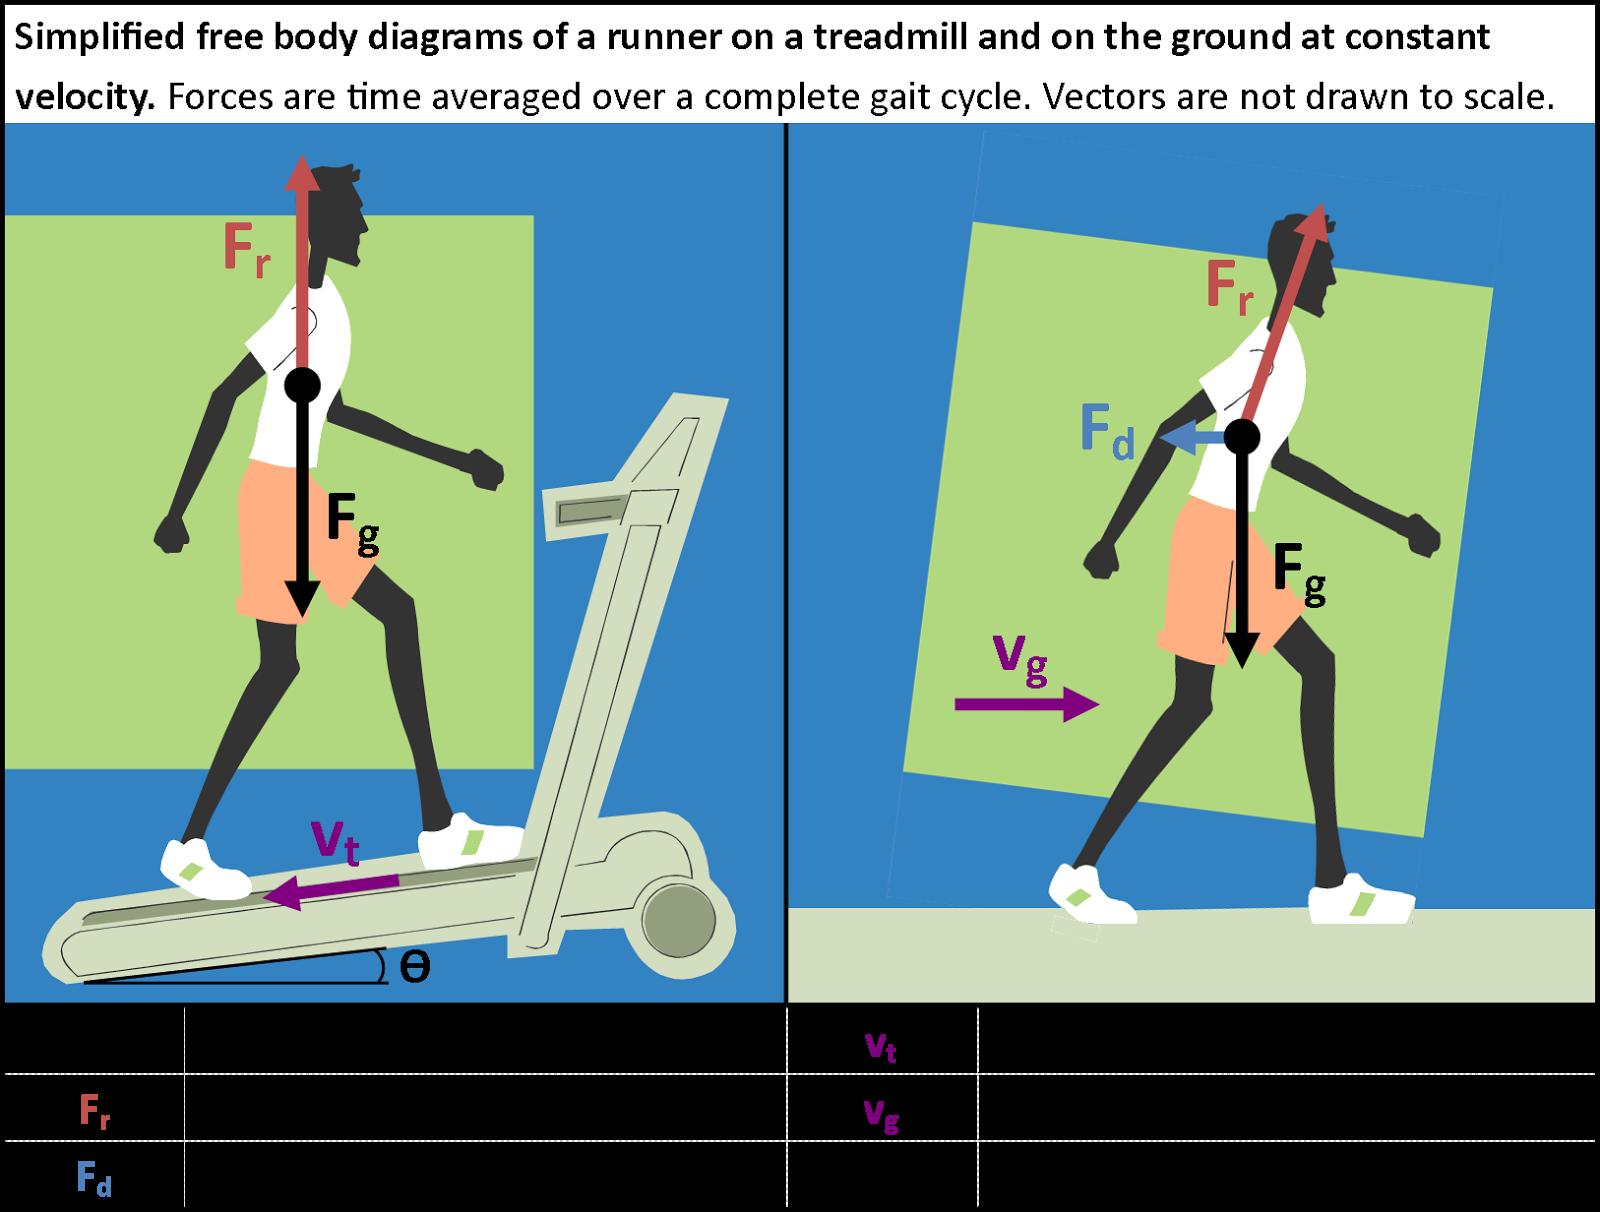 diagram of forces forces free body diagram free body diagram forces balanced xlr wiring rca unbalanced [ 1600 x 1212 Pixel ]